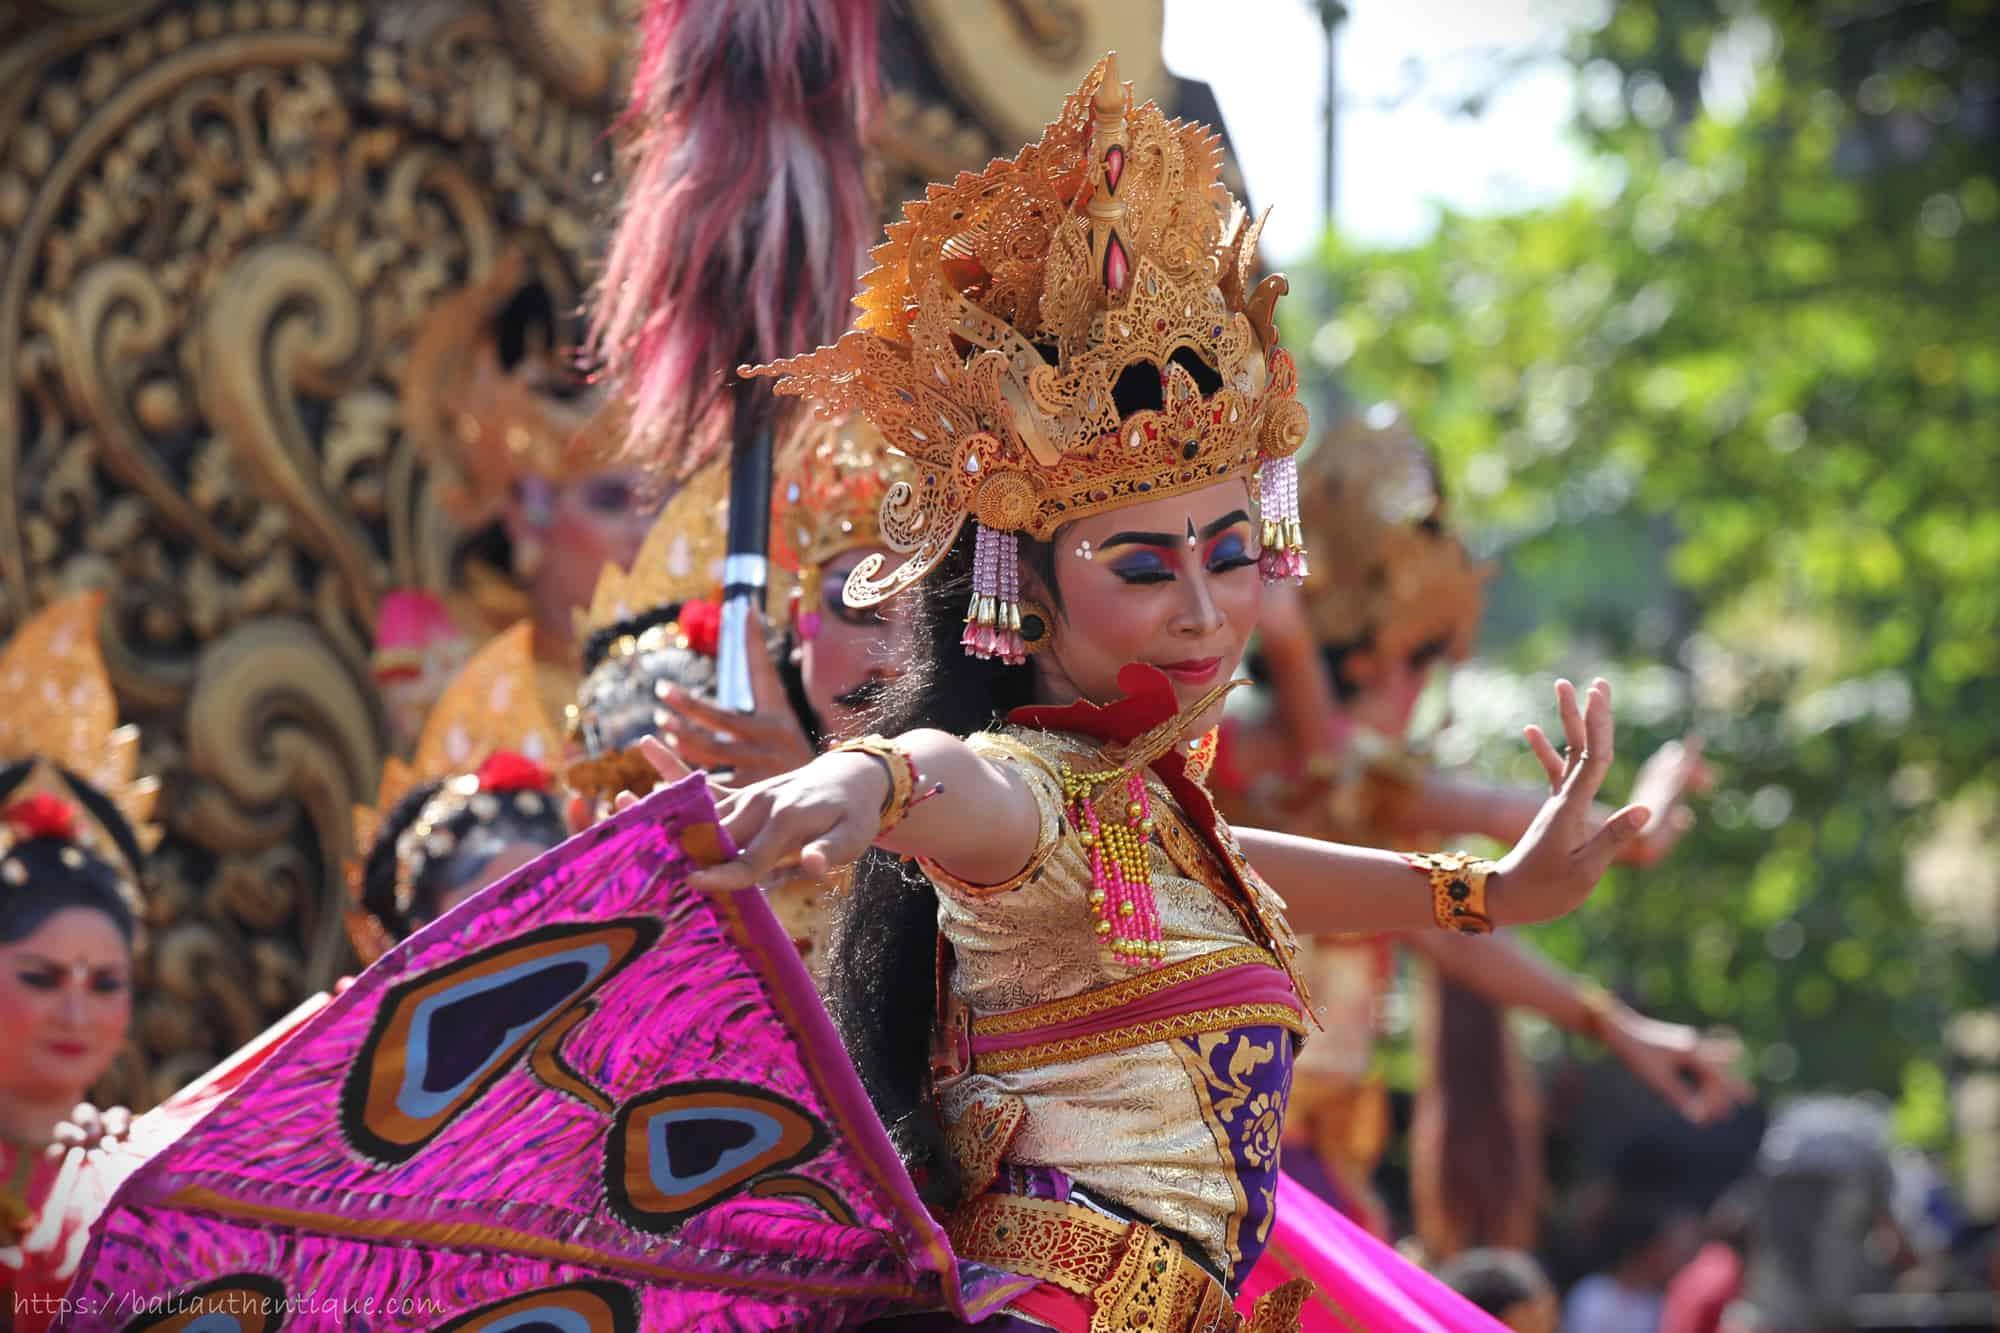 danse traditionnelle Balinaise